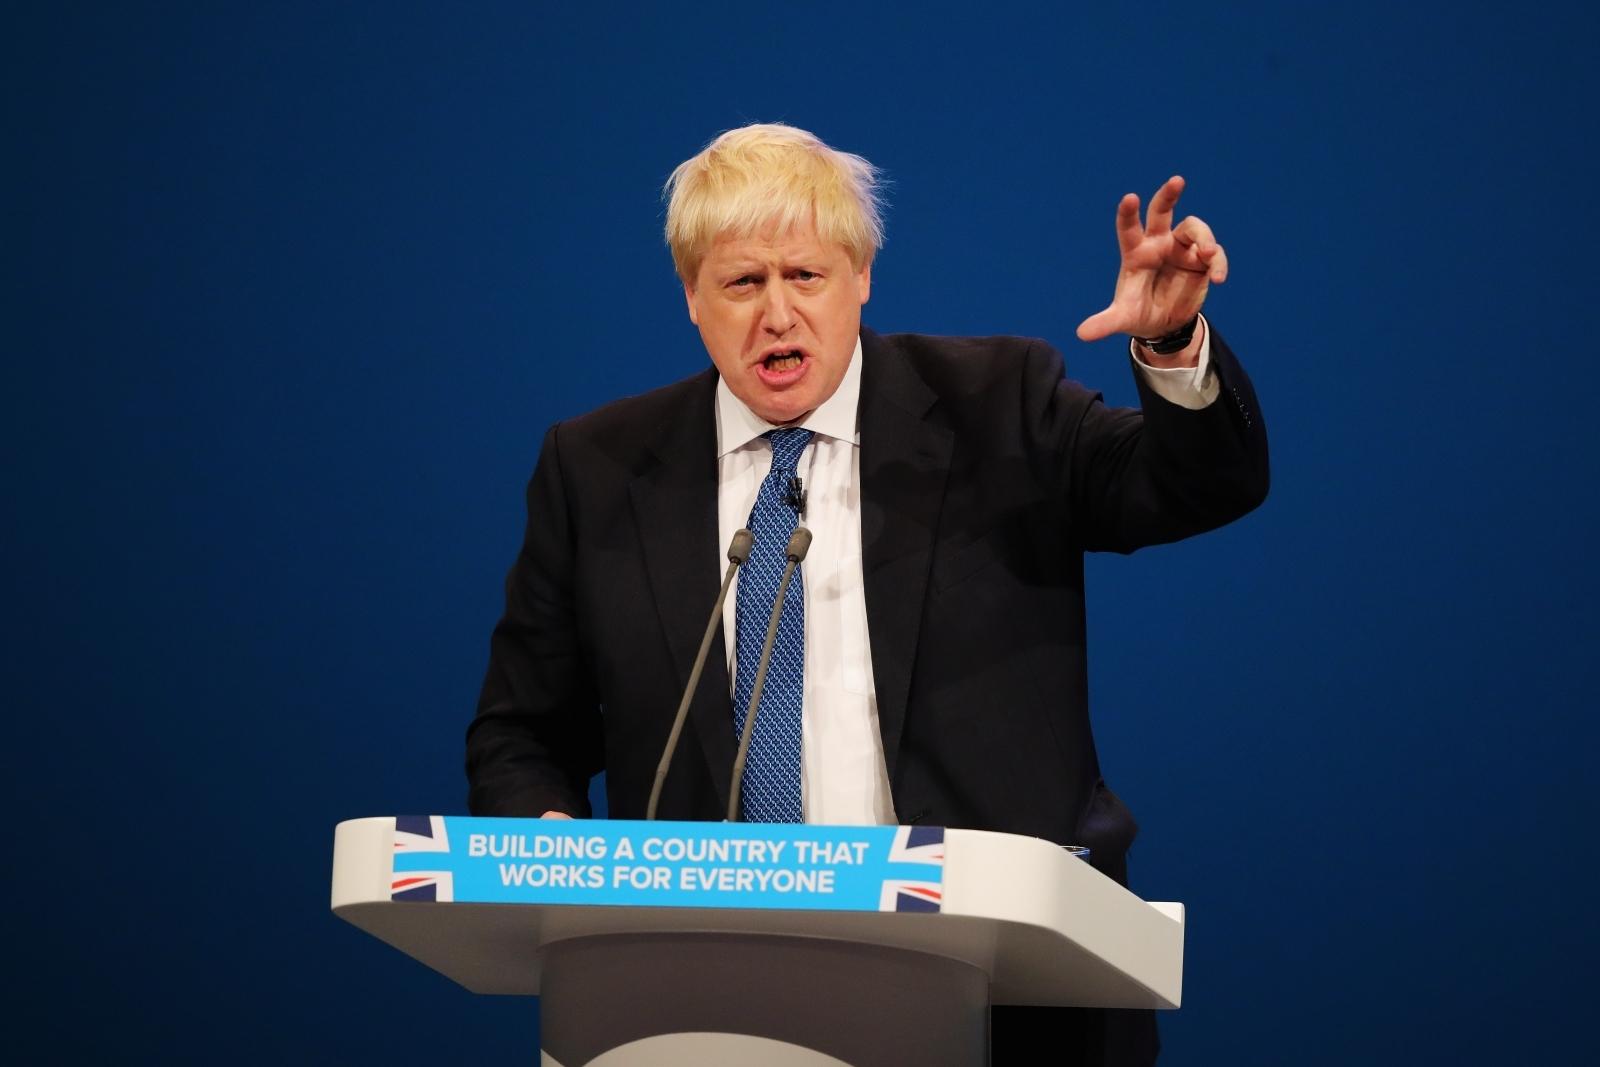 Boris Johnson Conservative party conference speech